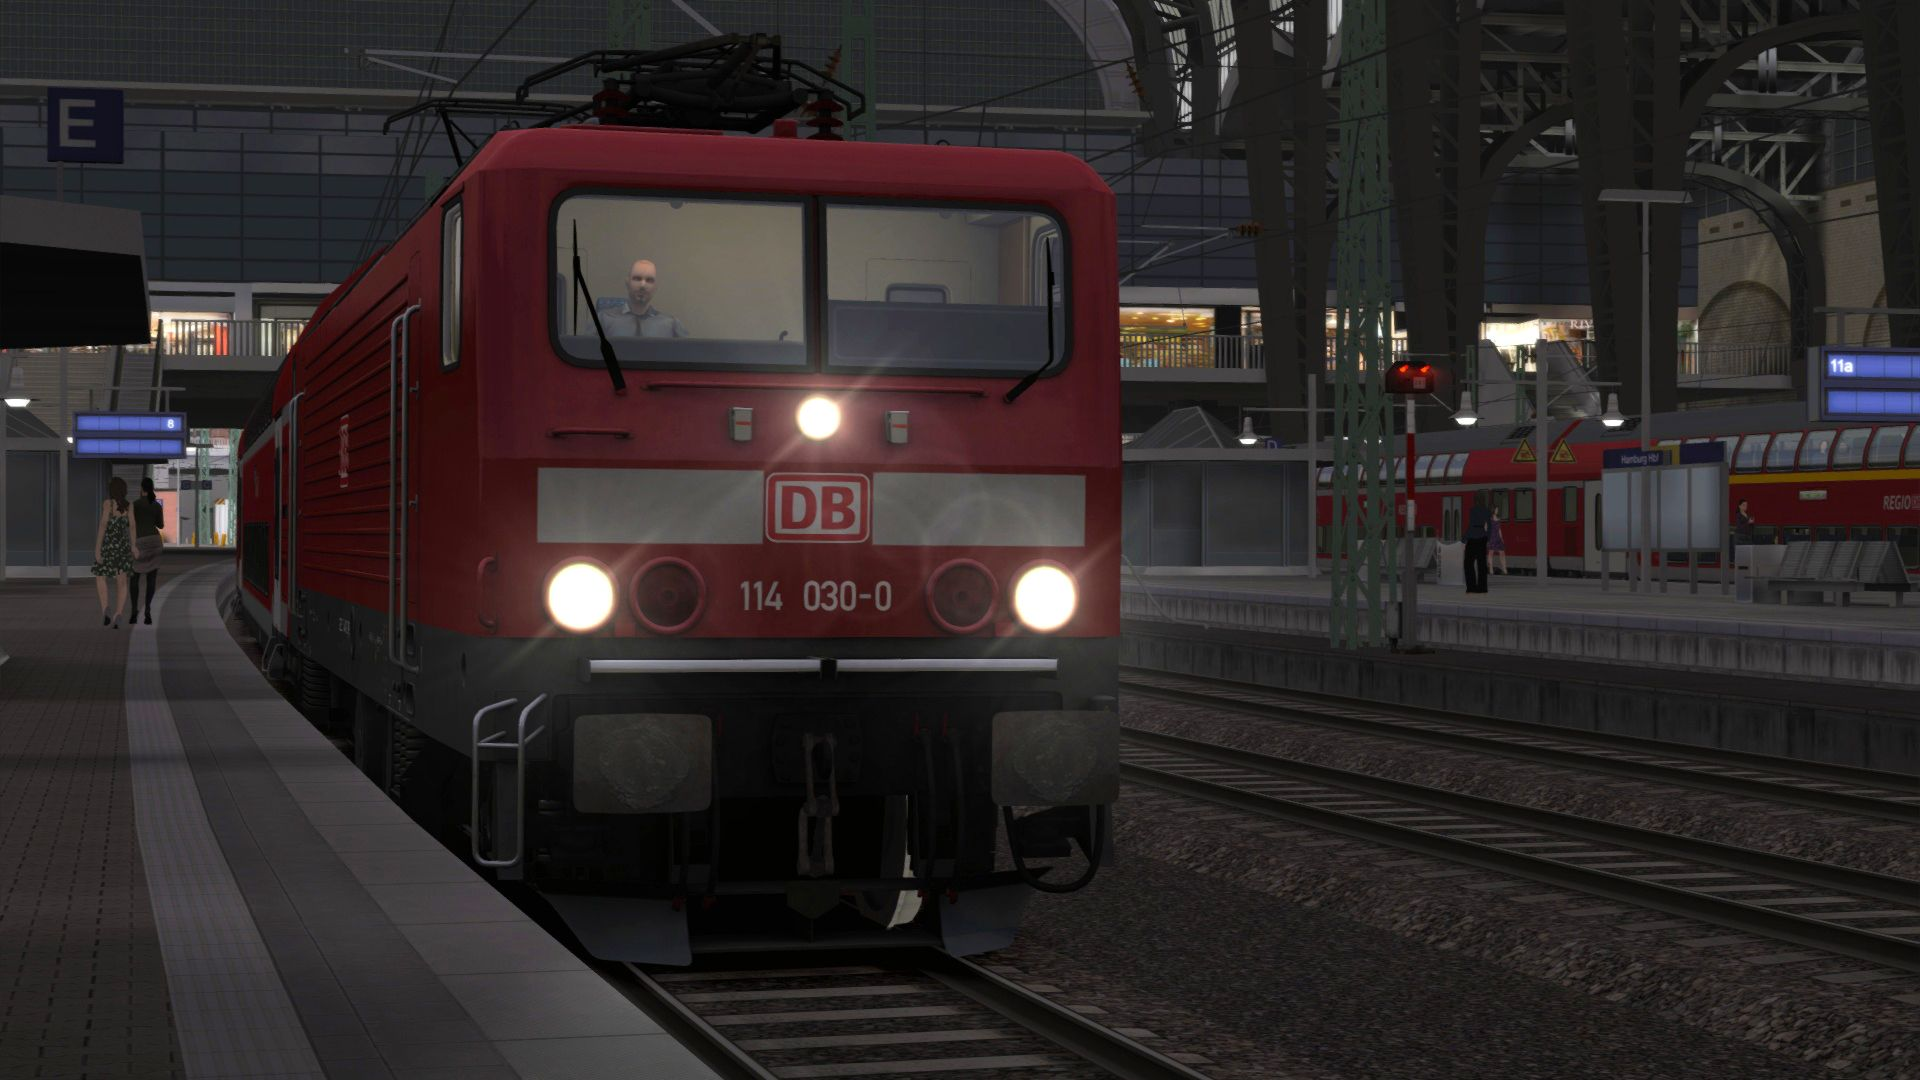 BR1141